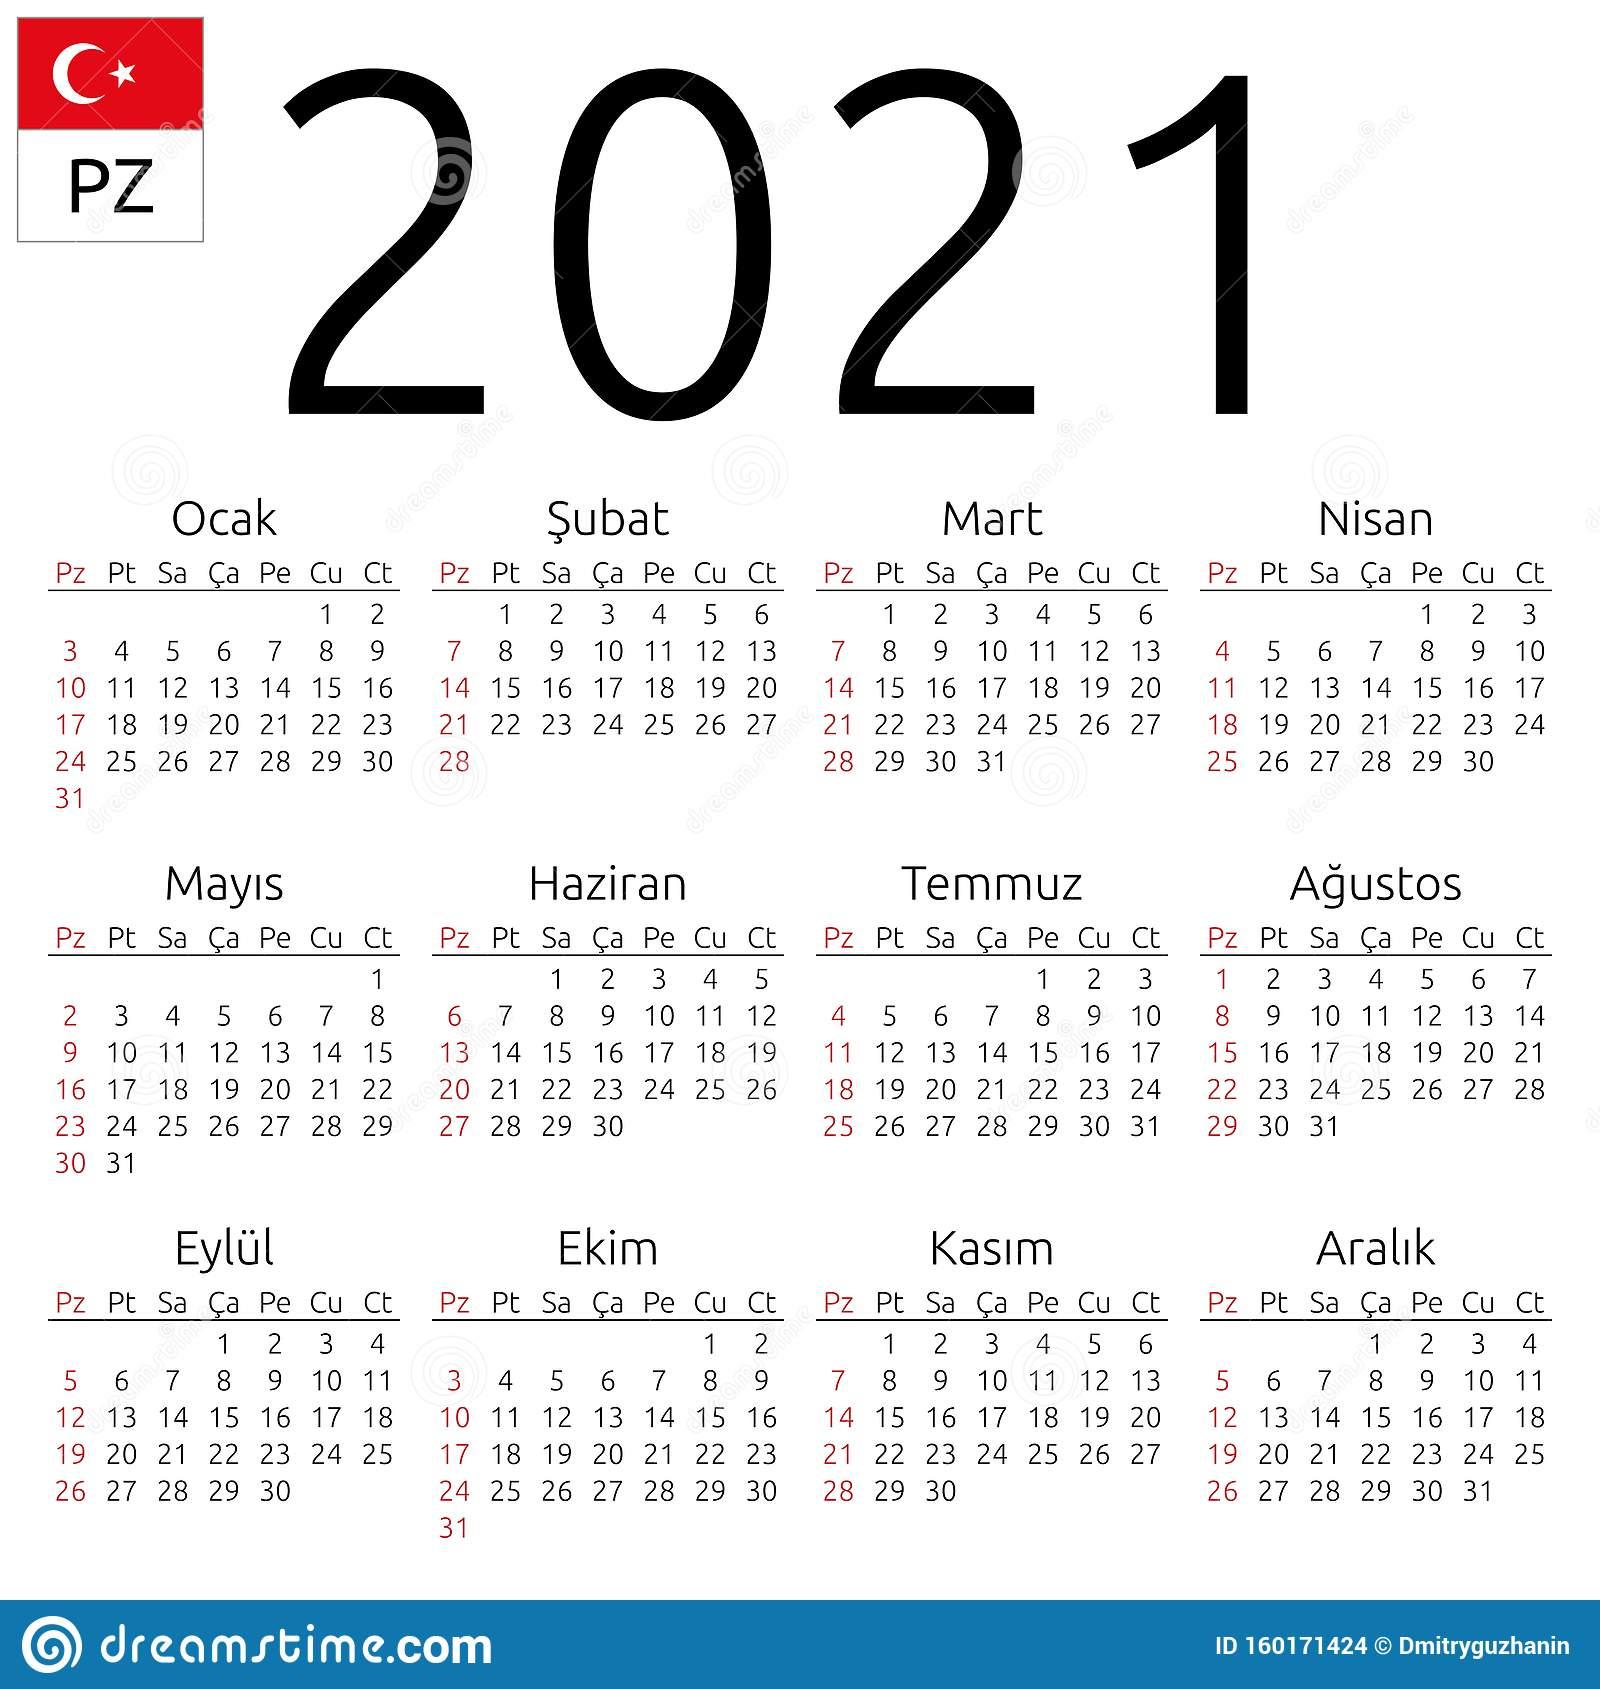 Islamic Calendar 2021 Today Date In Pakistan | Printable March with regard to Islamic Calendar Date Today In Pakistan